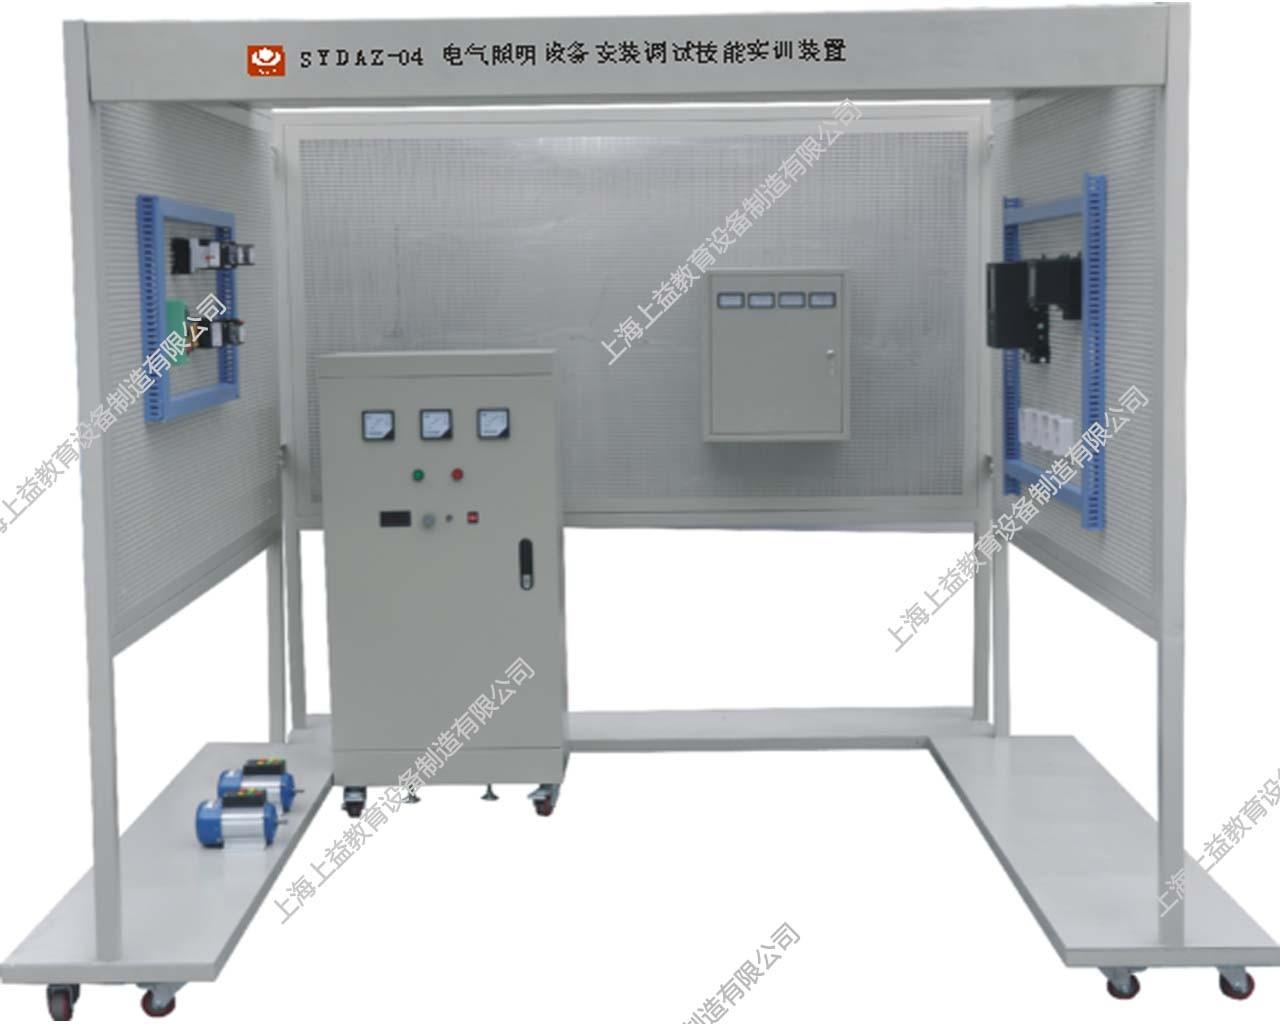 SYDAZ-04 电气照明设备安装调试技能wwwlehu8vip装置